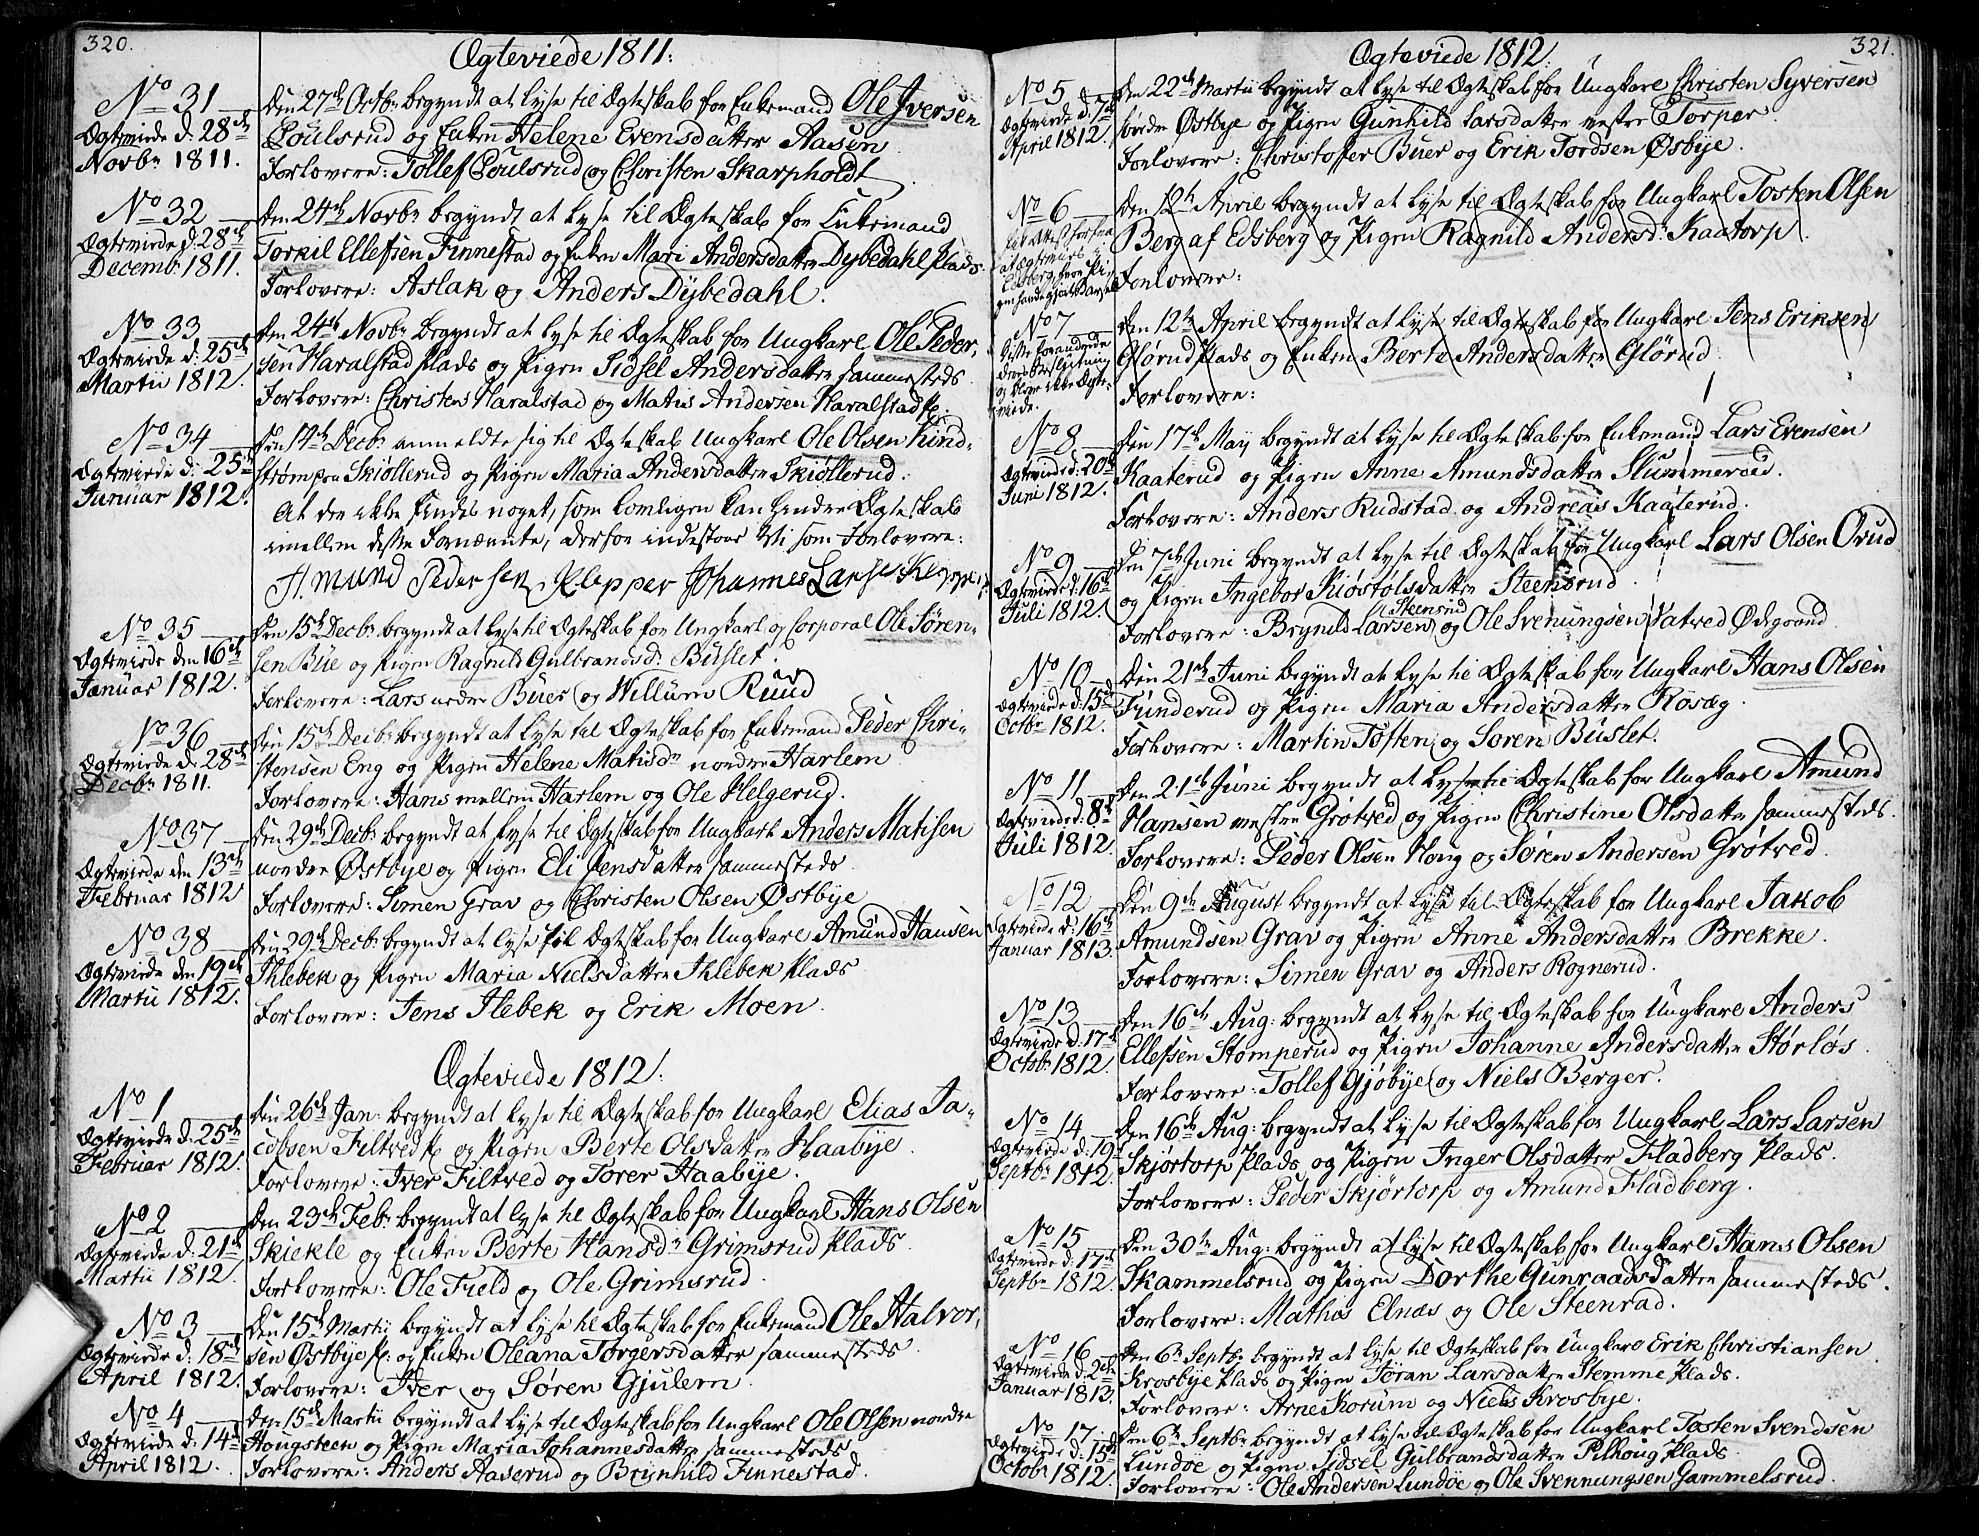 SAO, Rakkestad prestekontor Kirkebøker, F/Fa/L0005: Parish register (official) no. I 5, 1784-1814, p. 320-321